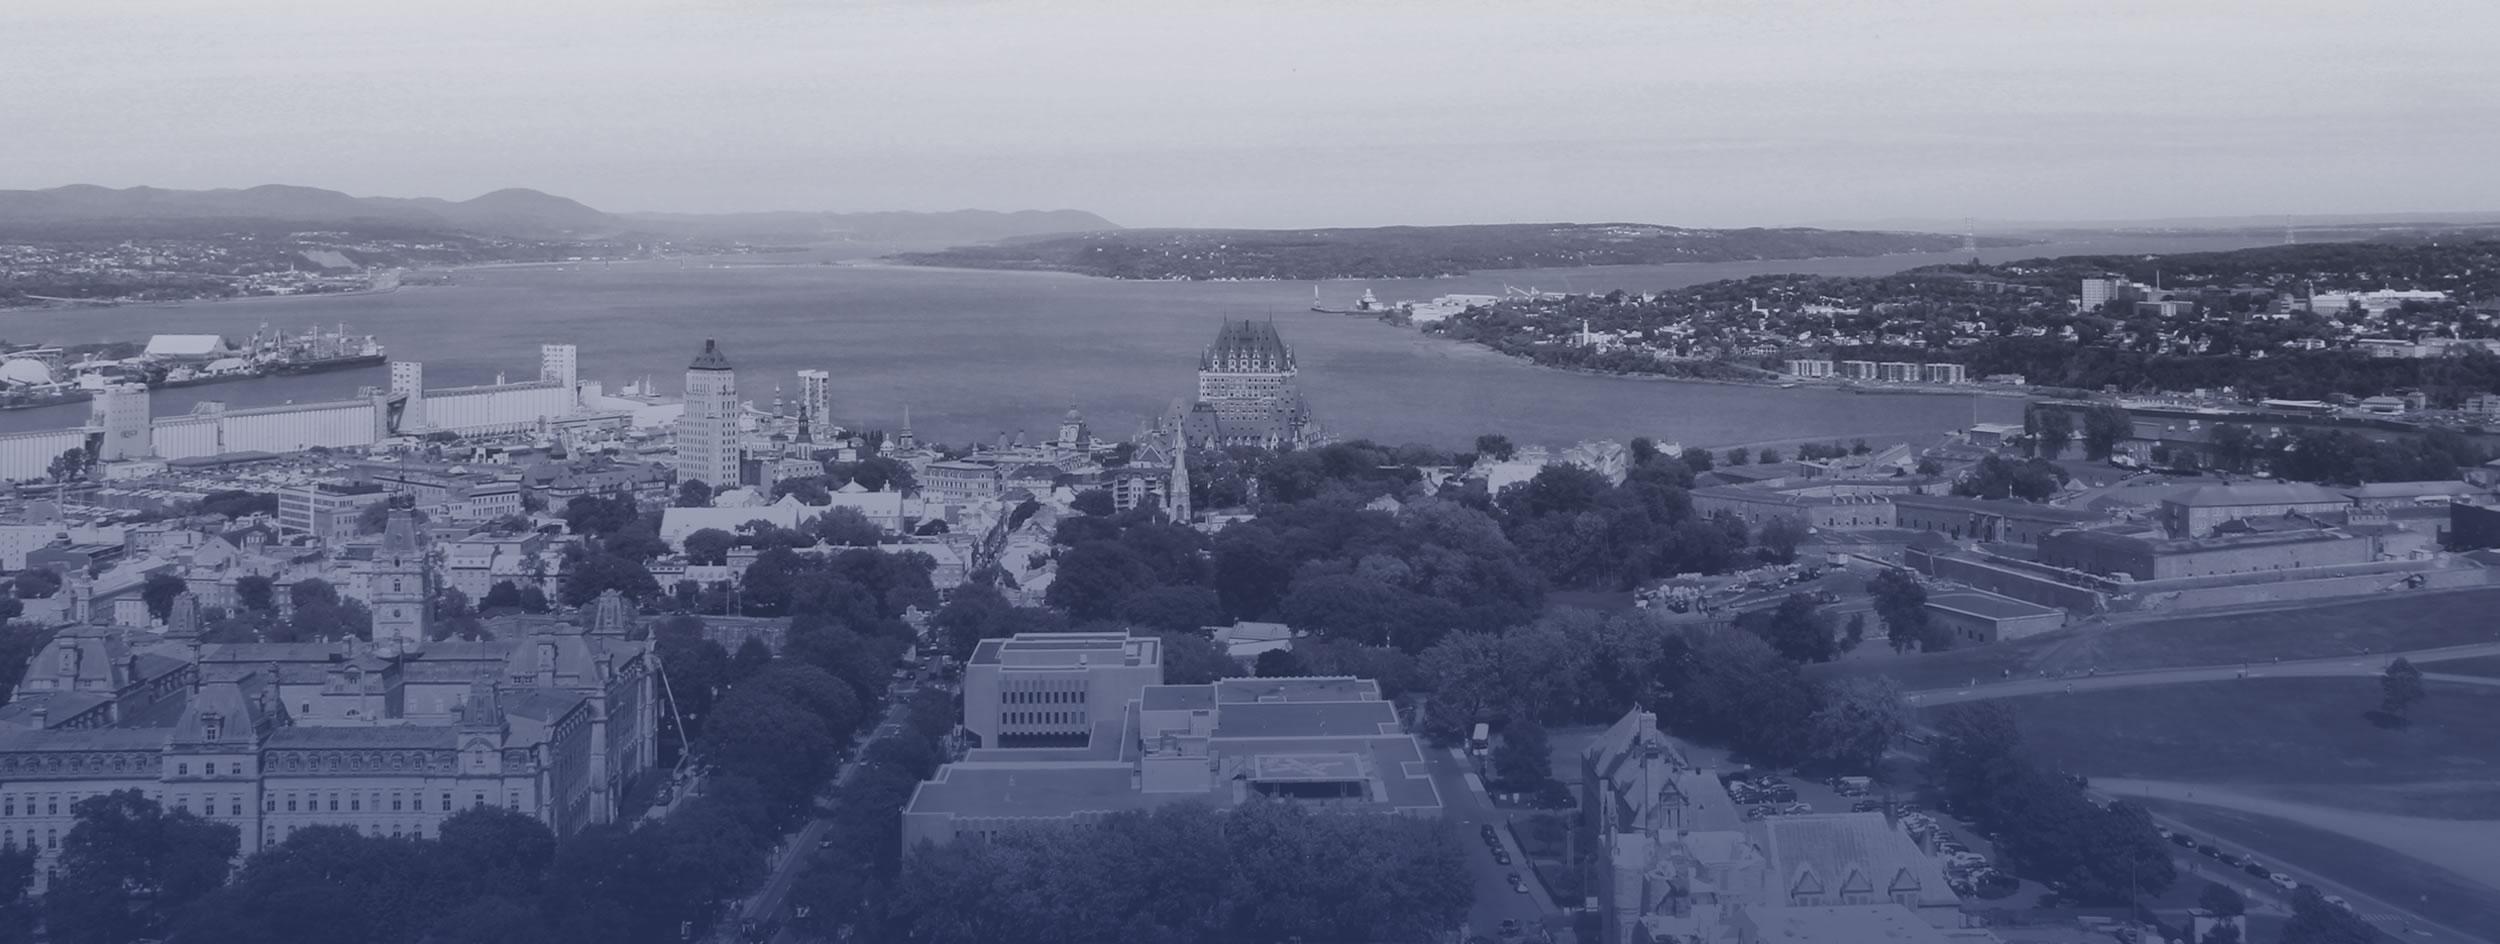 Ville de Québec - Jean-François Bertrand Avocats